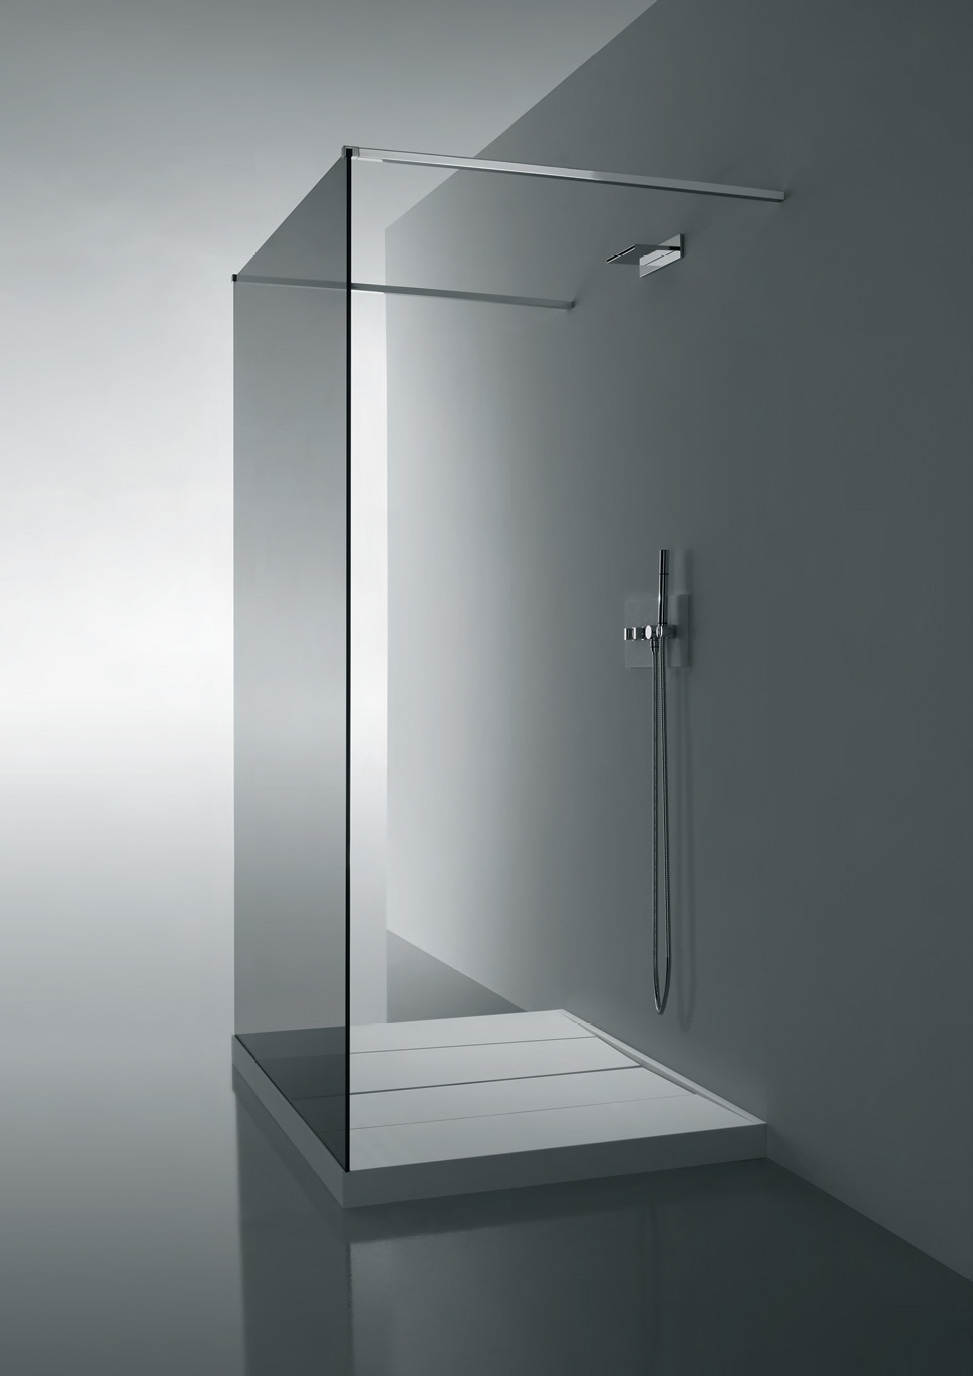 glass wall dividers bathroom photo - 8